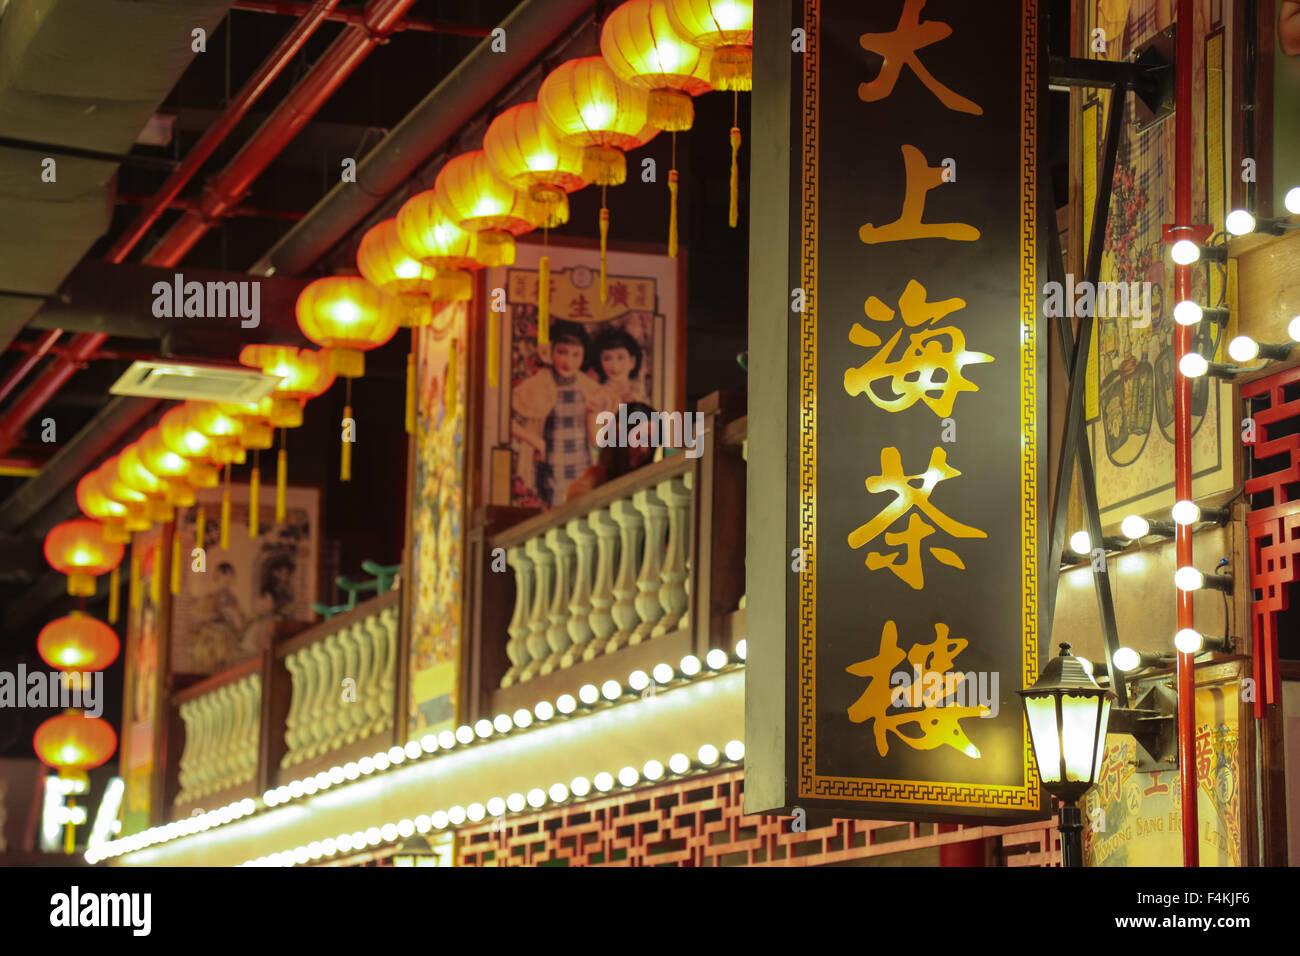 Vintage signboard of a Shanghai restaurant at Puchong  : vintage signboard of a shanghai restaurant at puchong setiawalk food F4KJF6 from www.alamy.com size 1300 x 956 jpeg 207kB